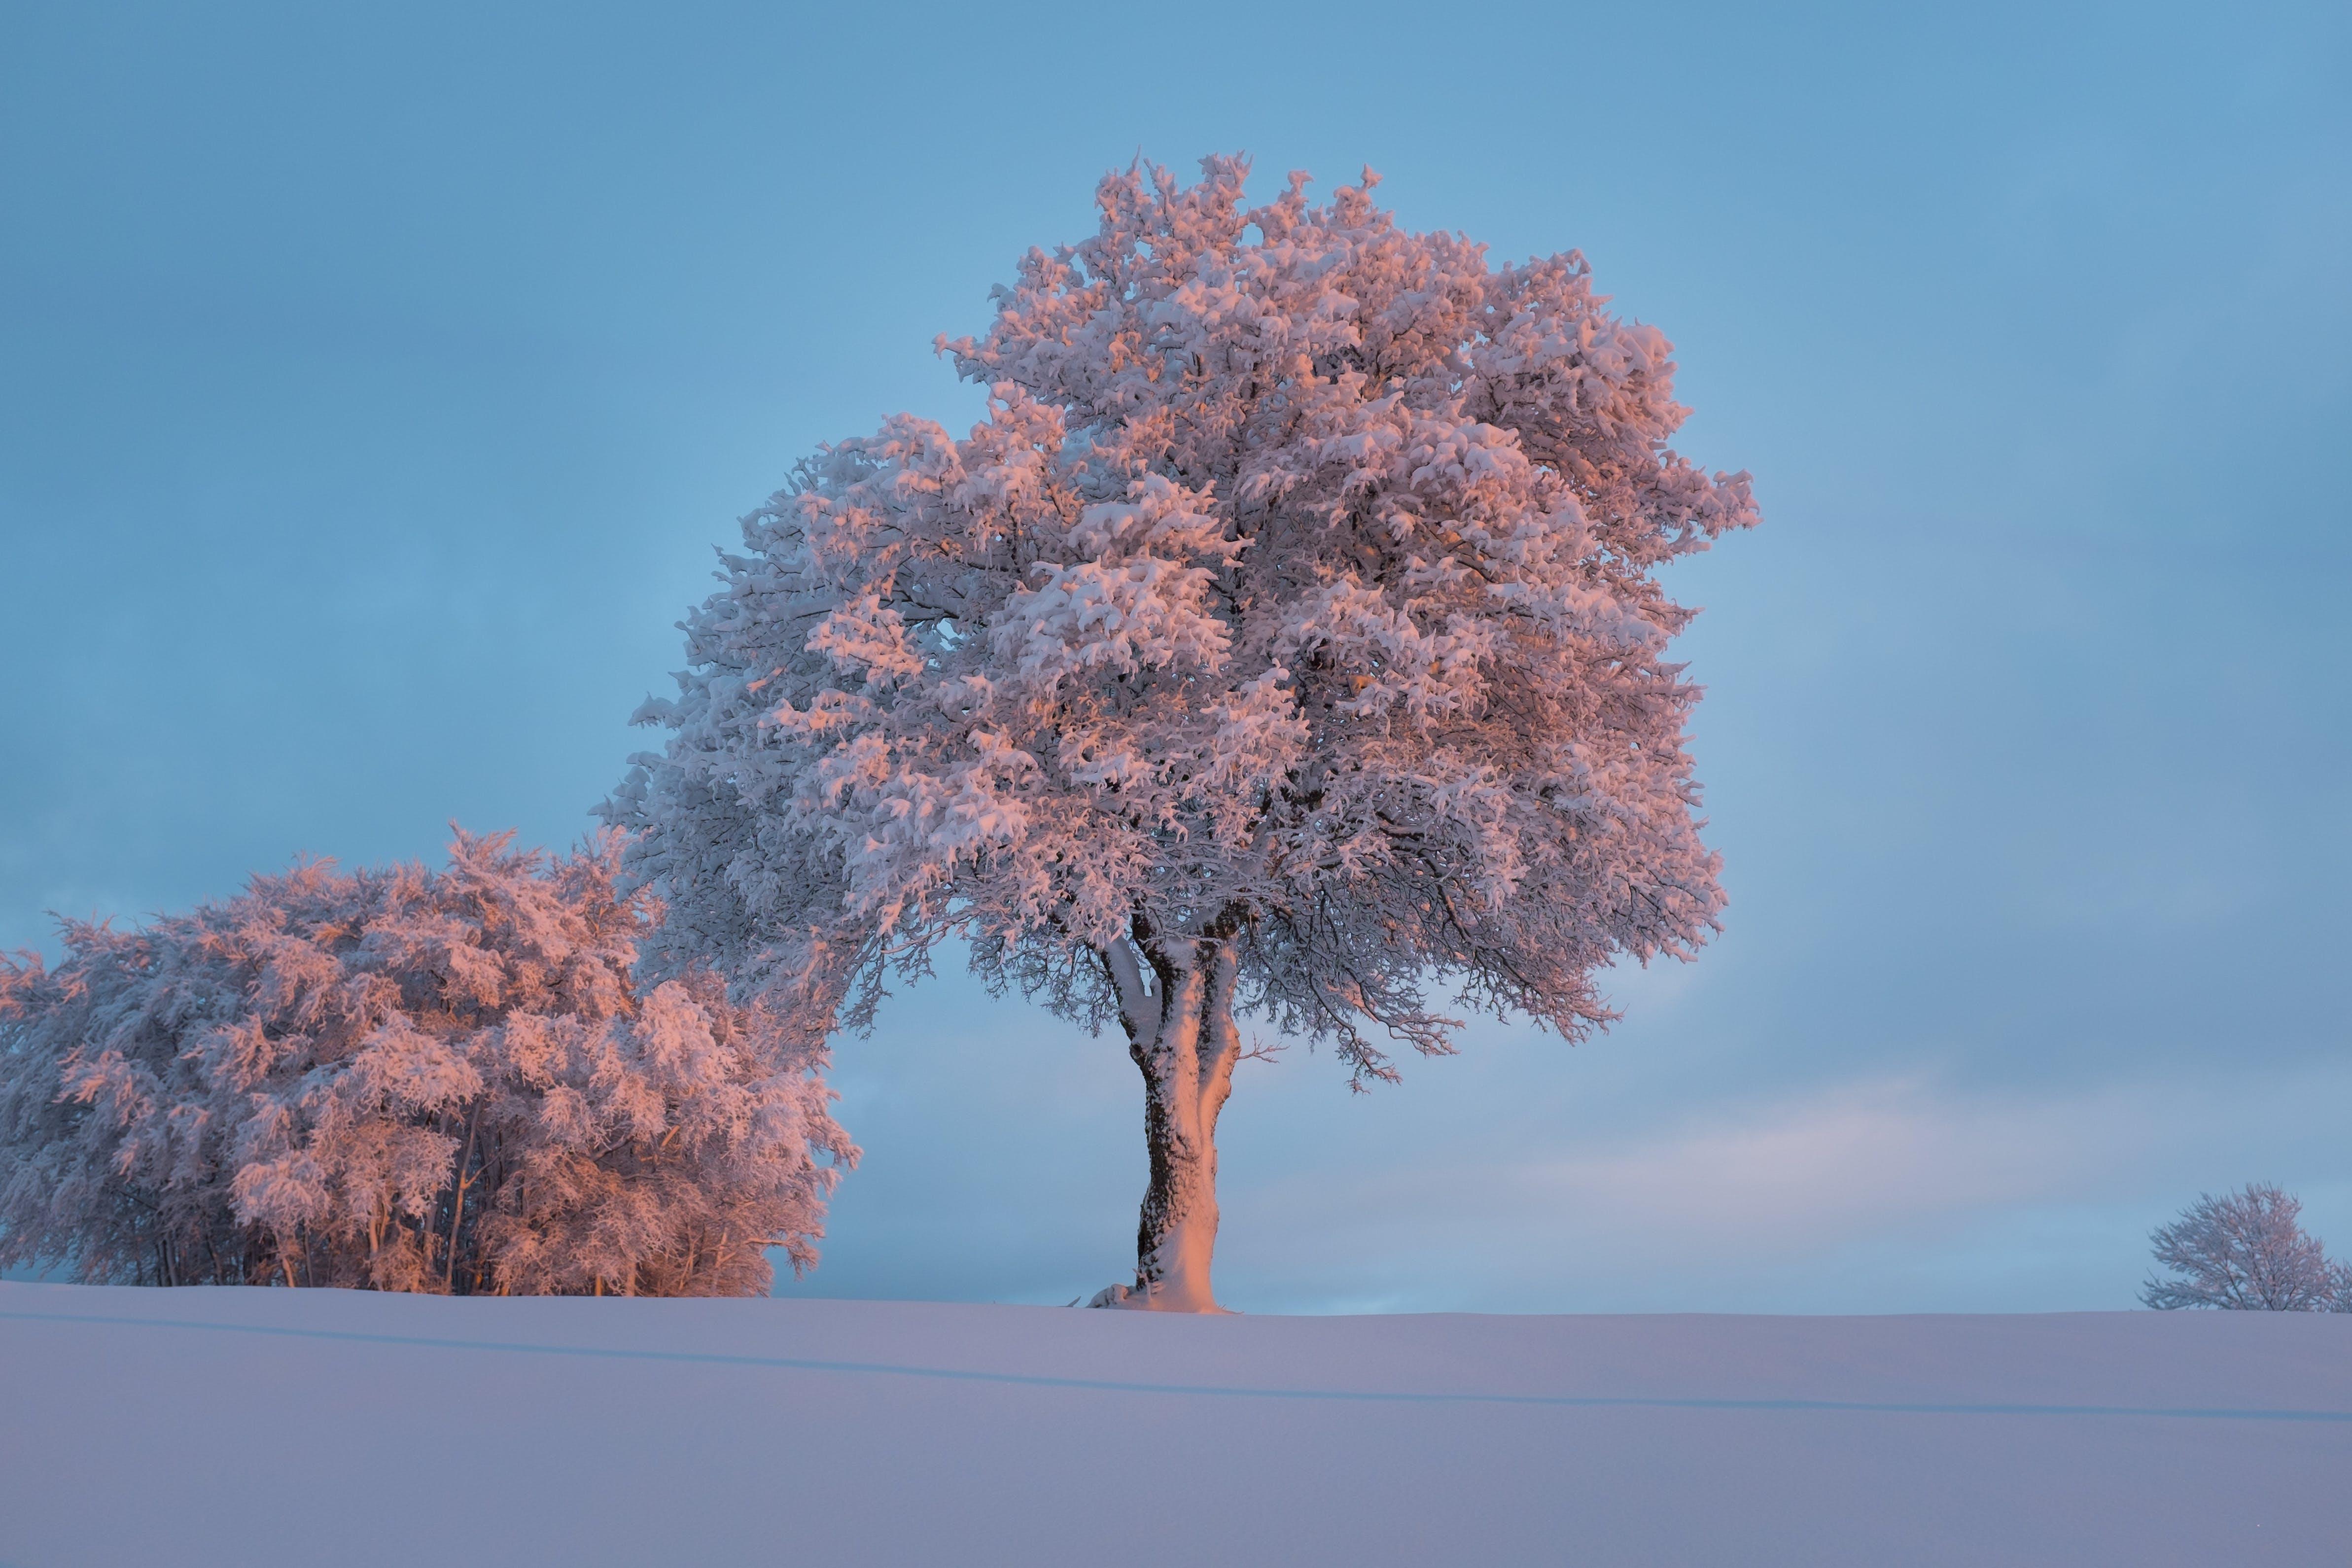 Pink Leaved Tree during Daytime